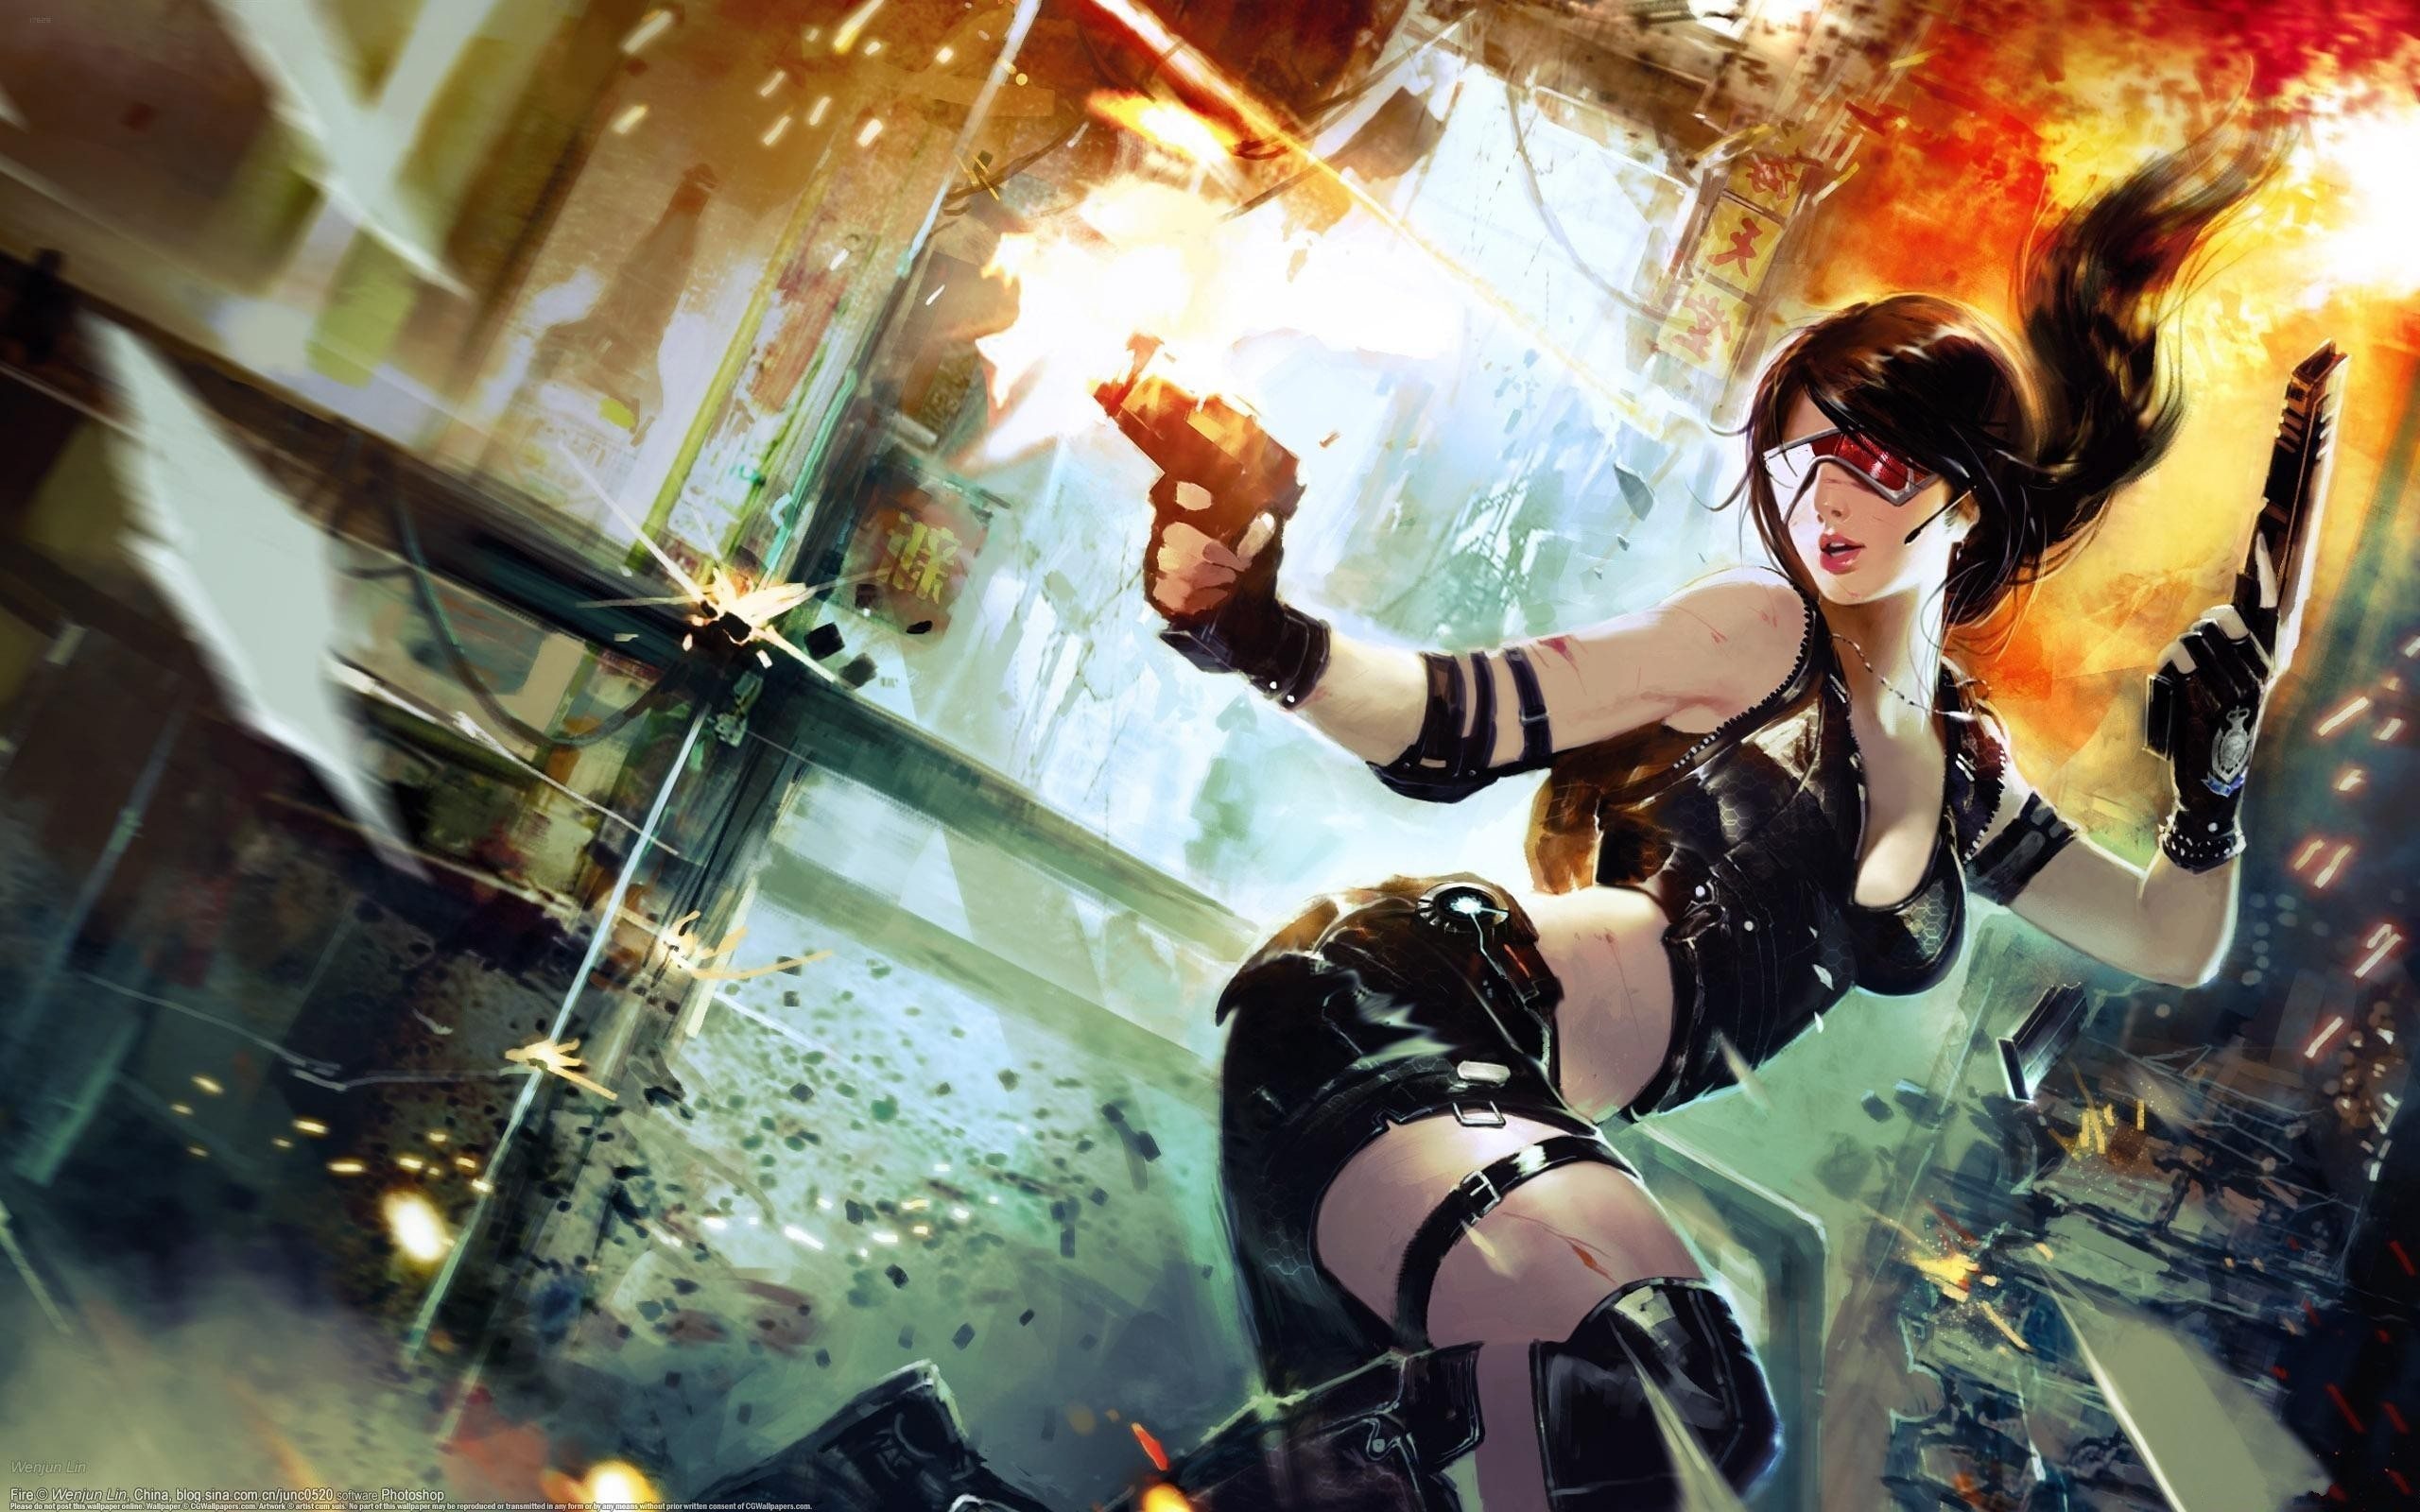 Artwork Cyberpunk Girls With Glasses Guns Weapons Women …